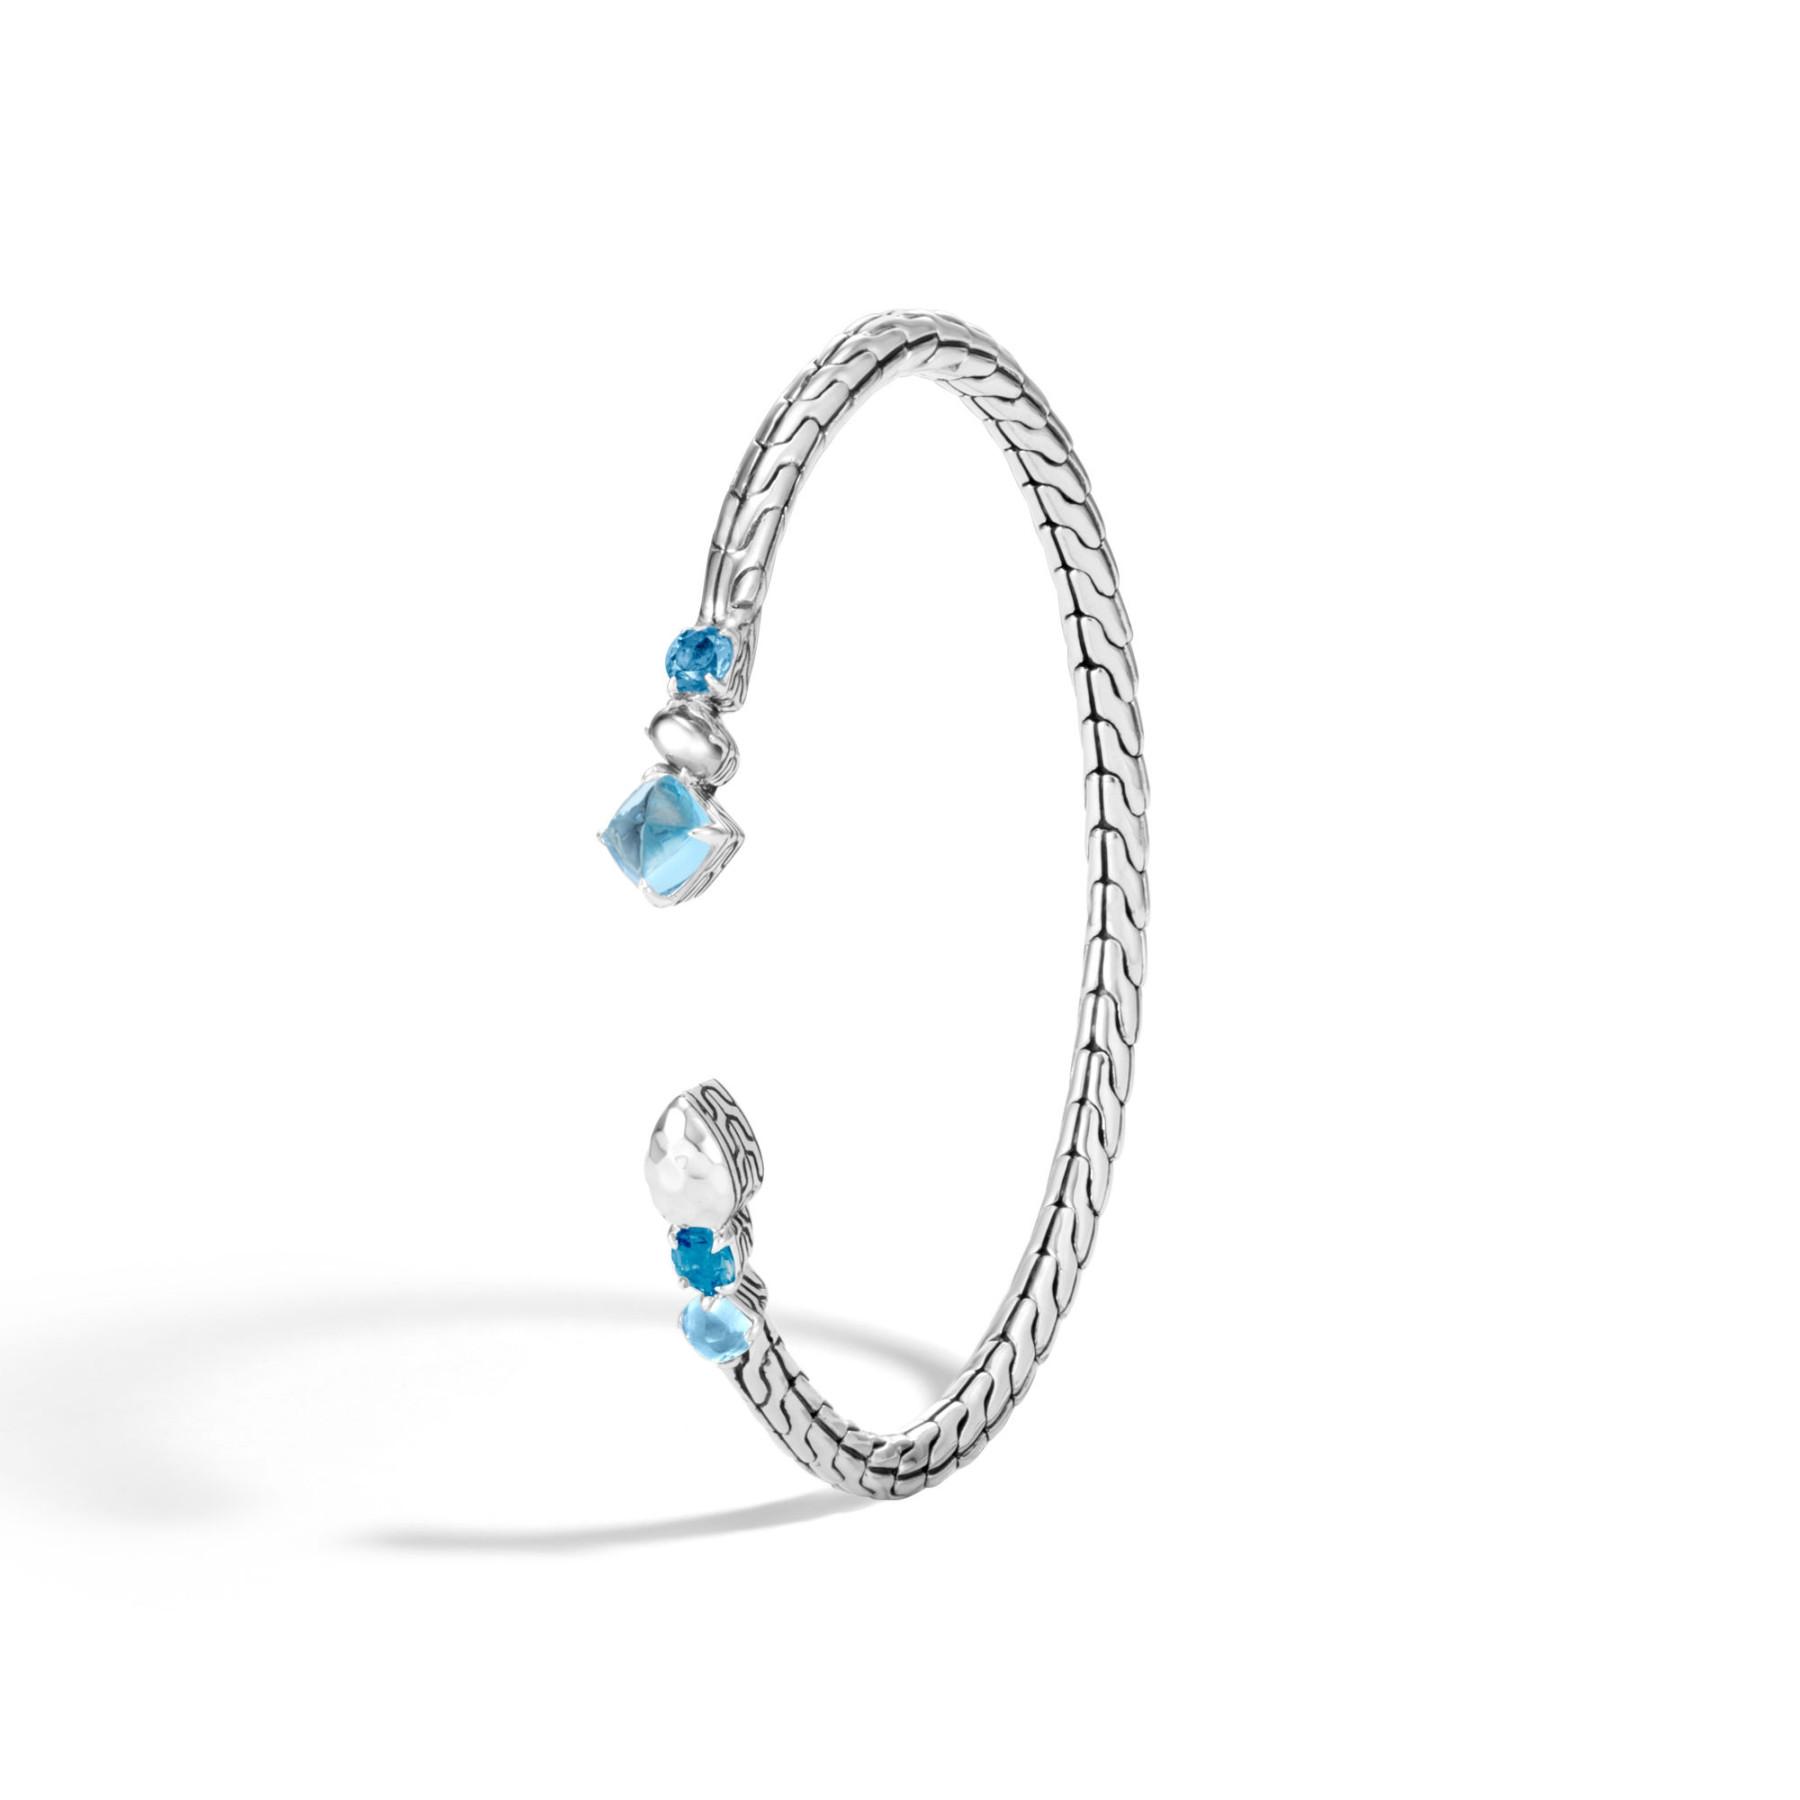 John Hardy Classic Chain London Blue Topaz Cuff Bracelet angle view